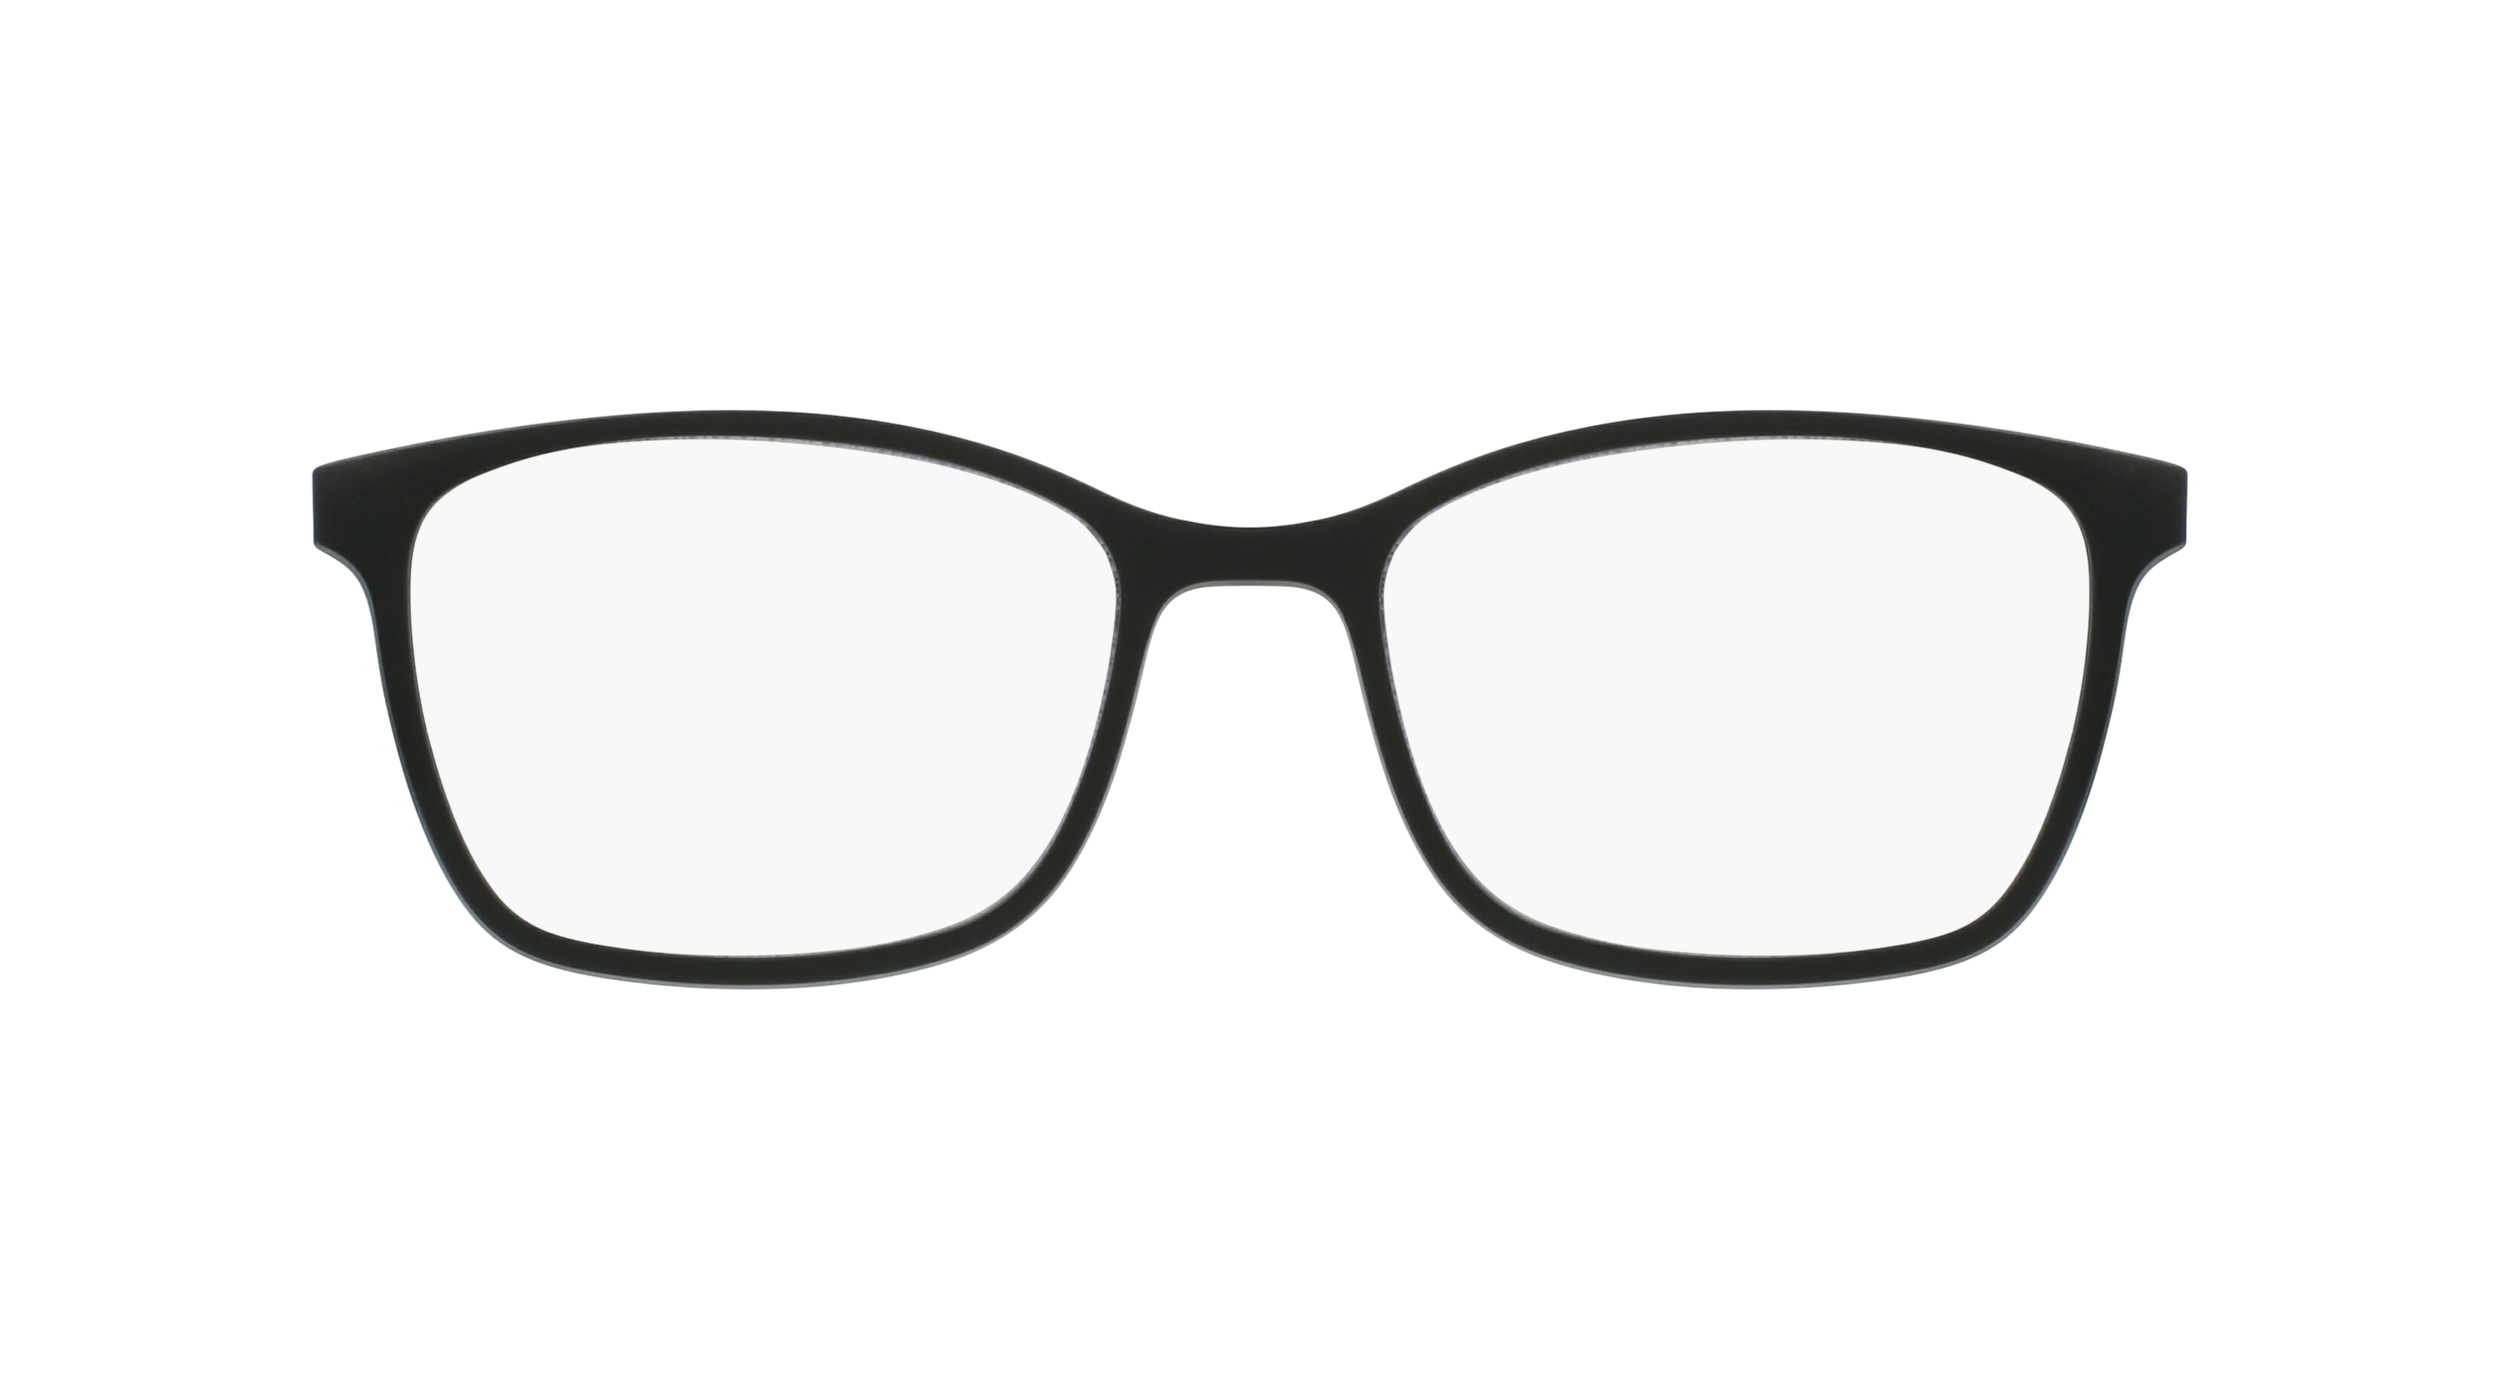 afflelou/france/products/smart_clip/clips_glasses/07630036459003.png